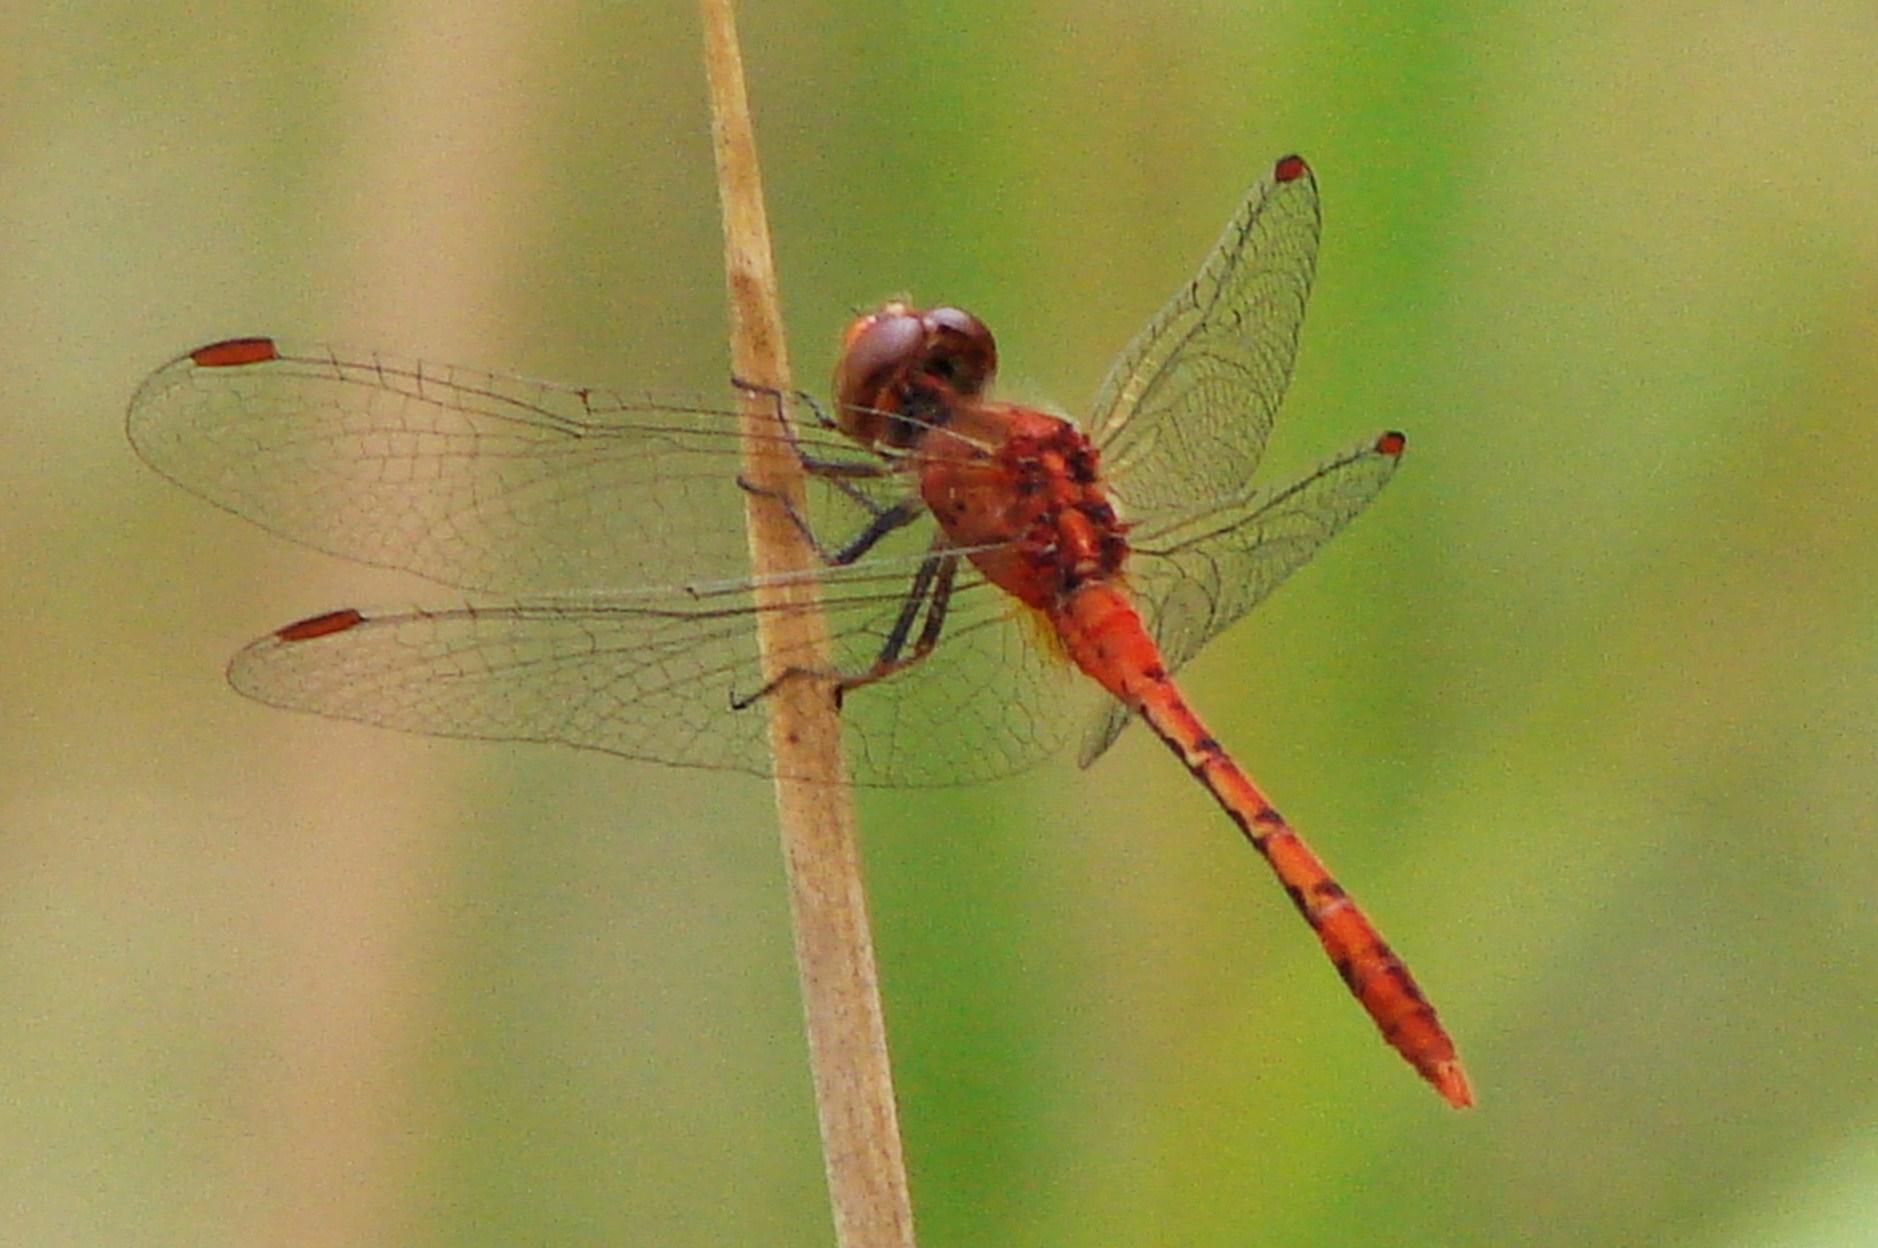 Libellulidae Wandering Percher Dragonfly Diplacodes bipunctata 01